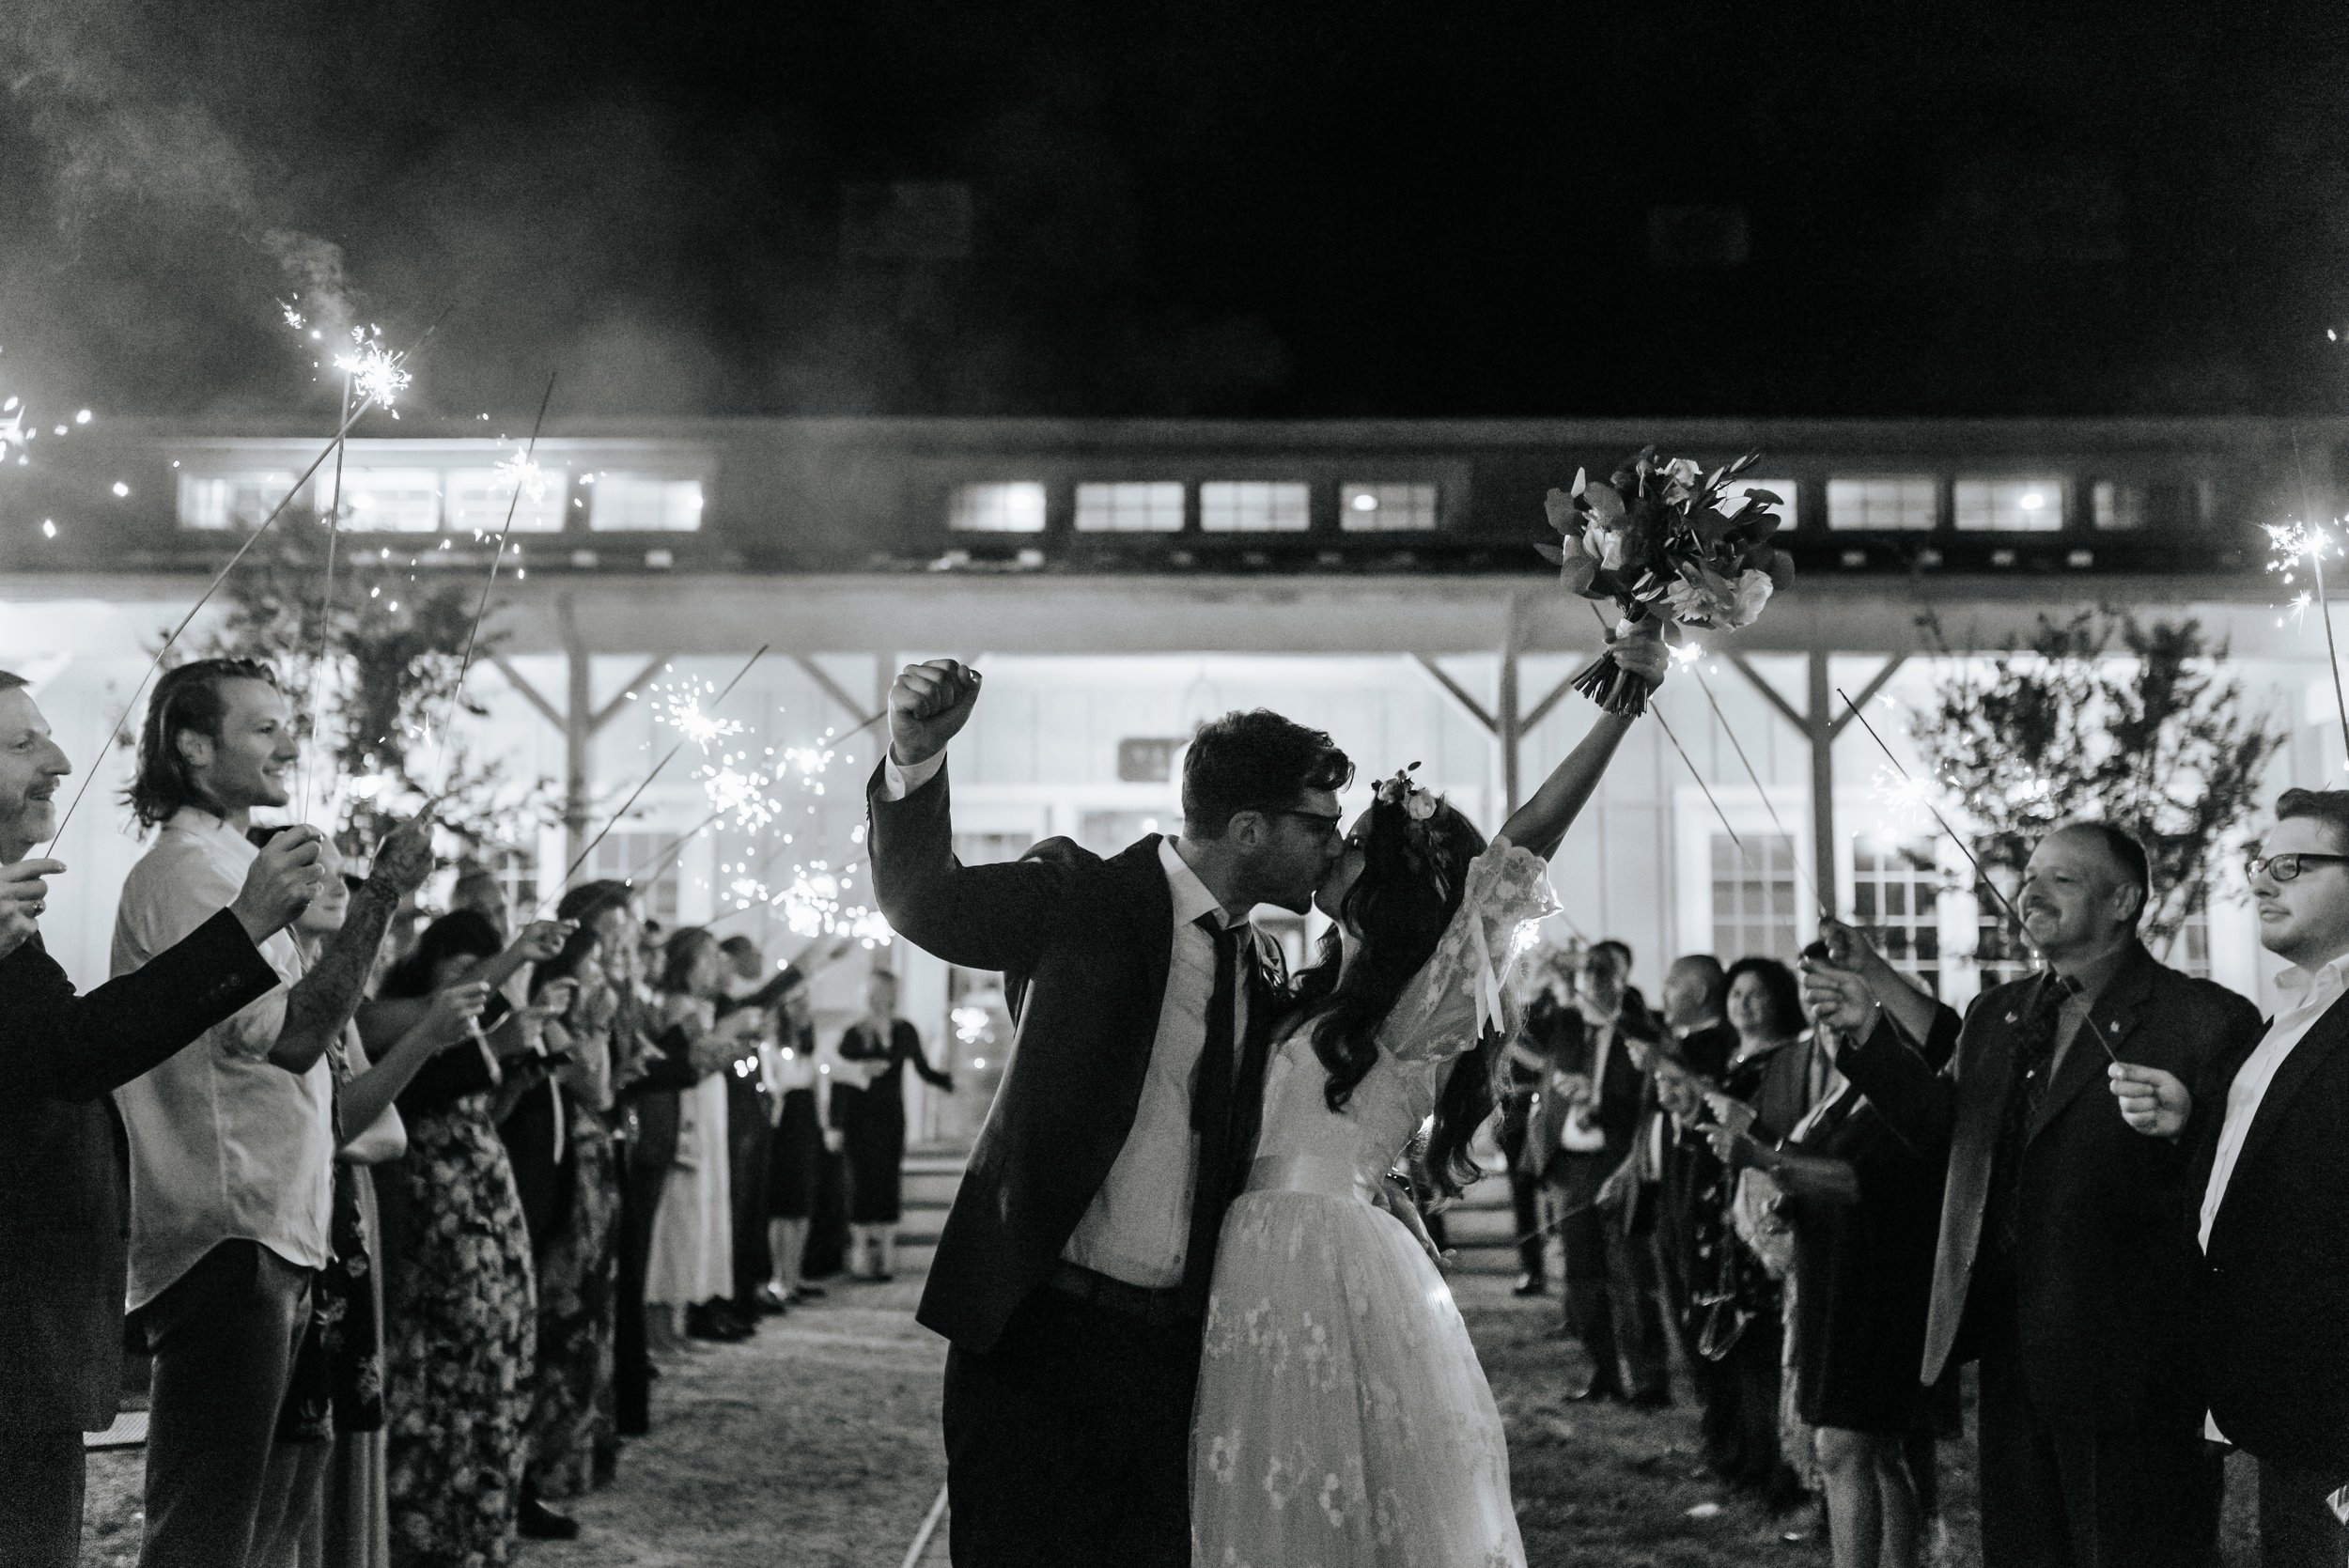 Veritas-Vineyards-and-Winery-Wedding-Photography-Afton-Virginia-Yasmin-Seth-Photography-by-V-9943.jpg